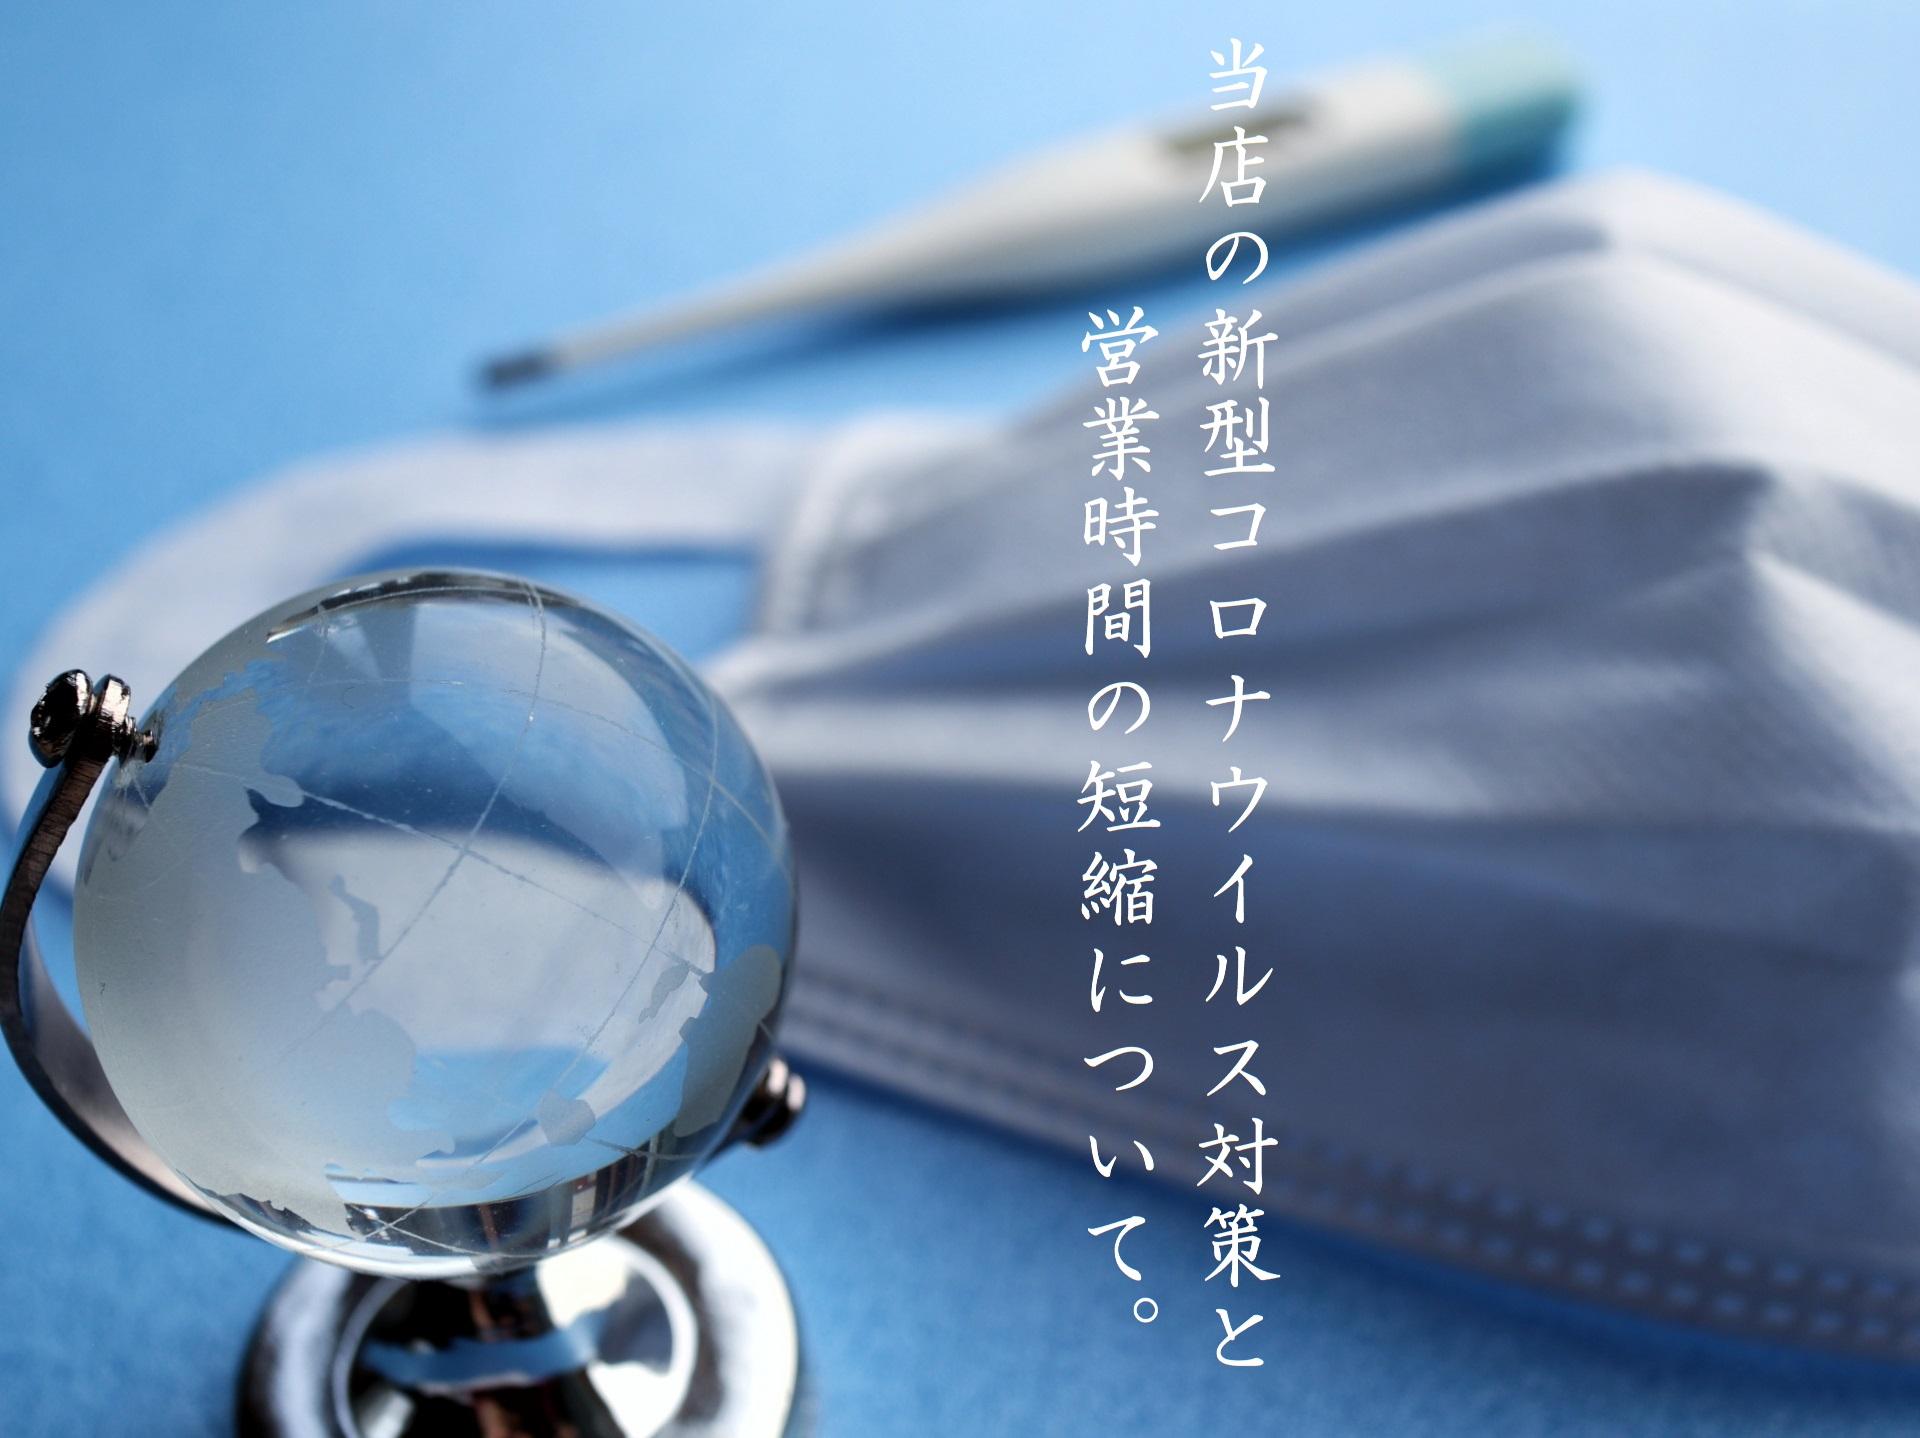 (NEW)新型コロナウイルスによる営業時間の変更と当店の感染対策について。